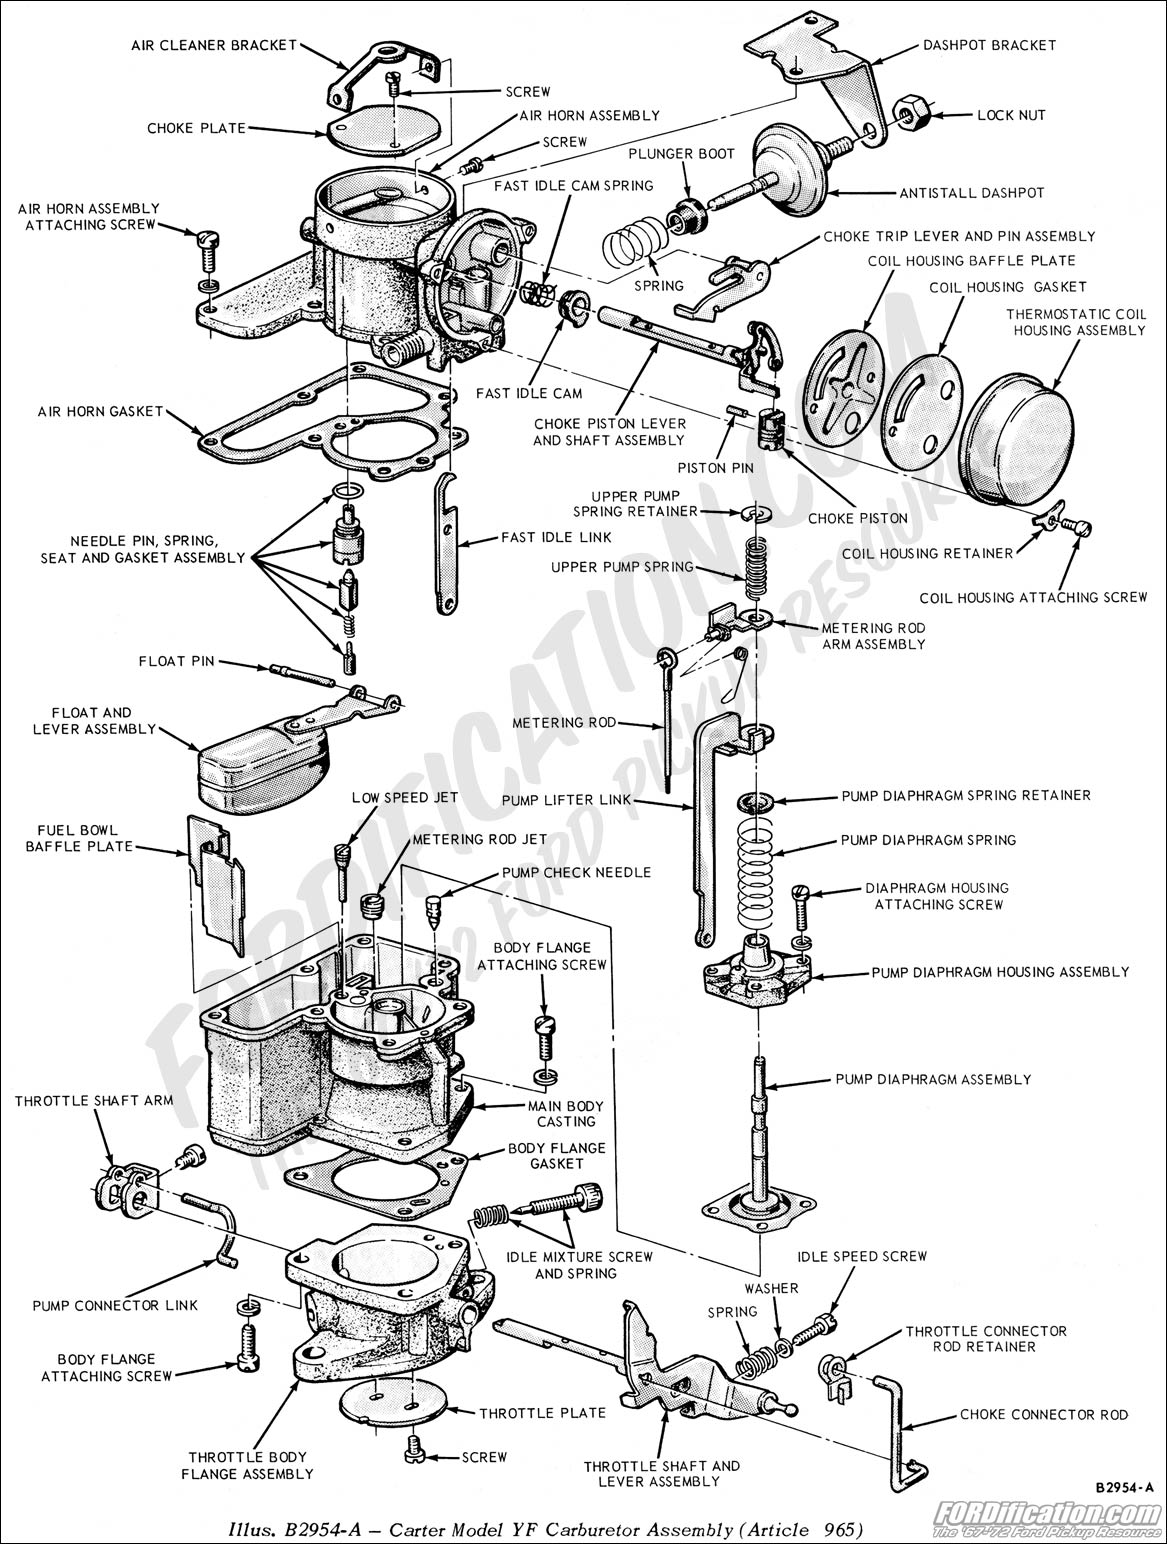 Carter w 1 carburetor diagram